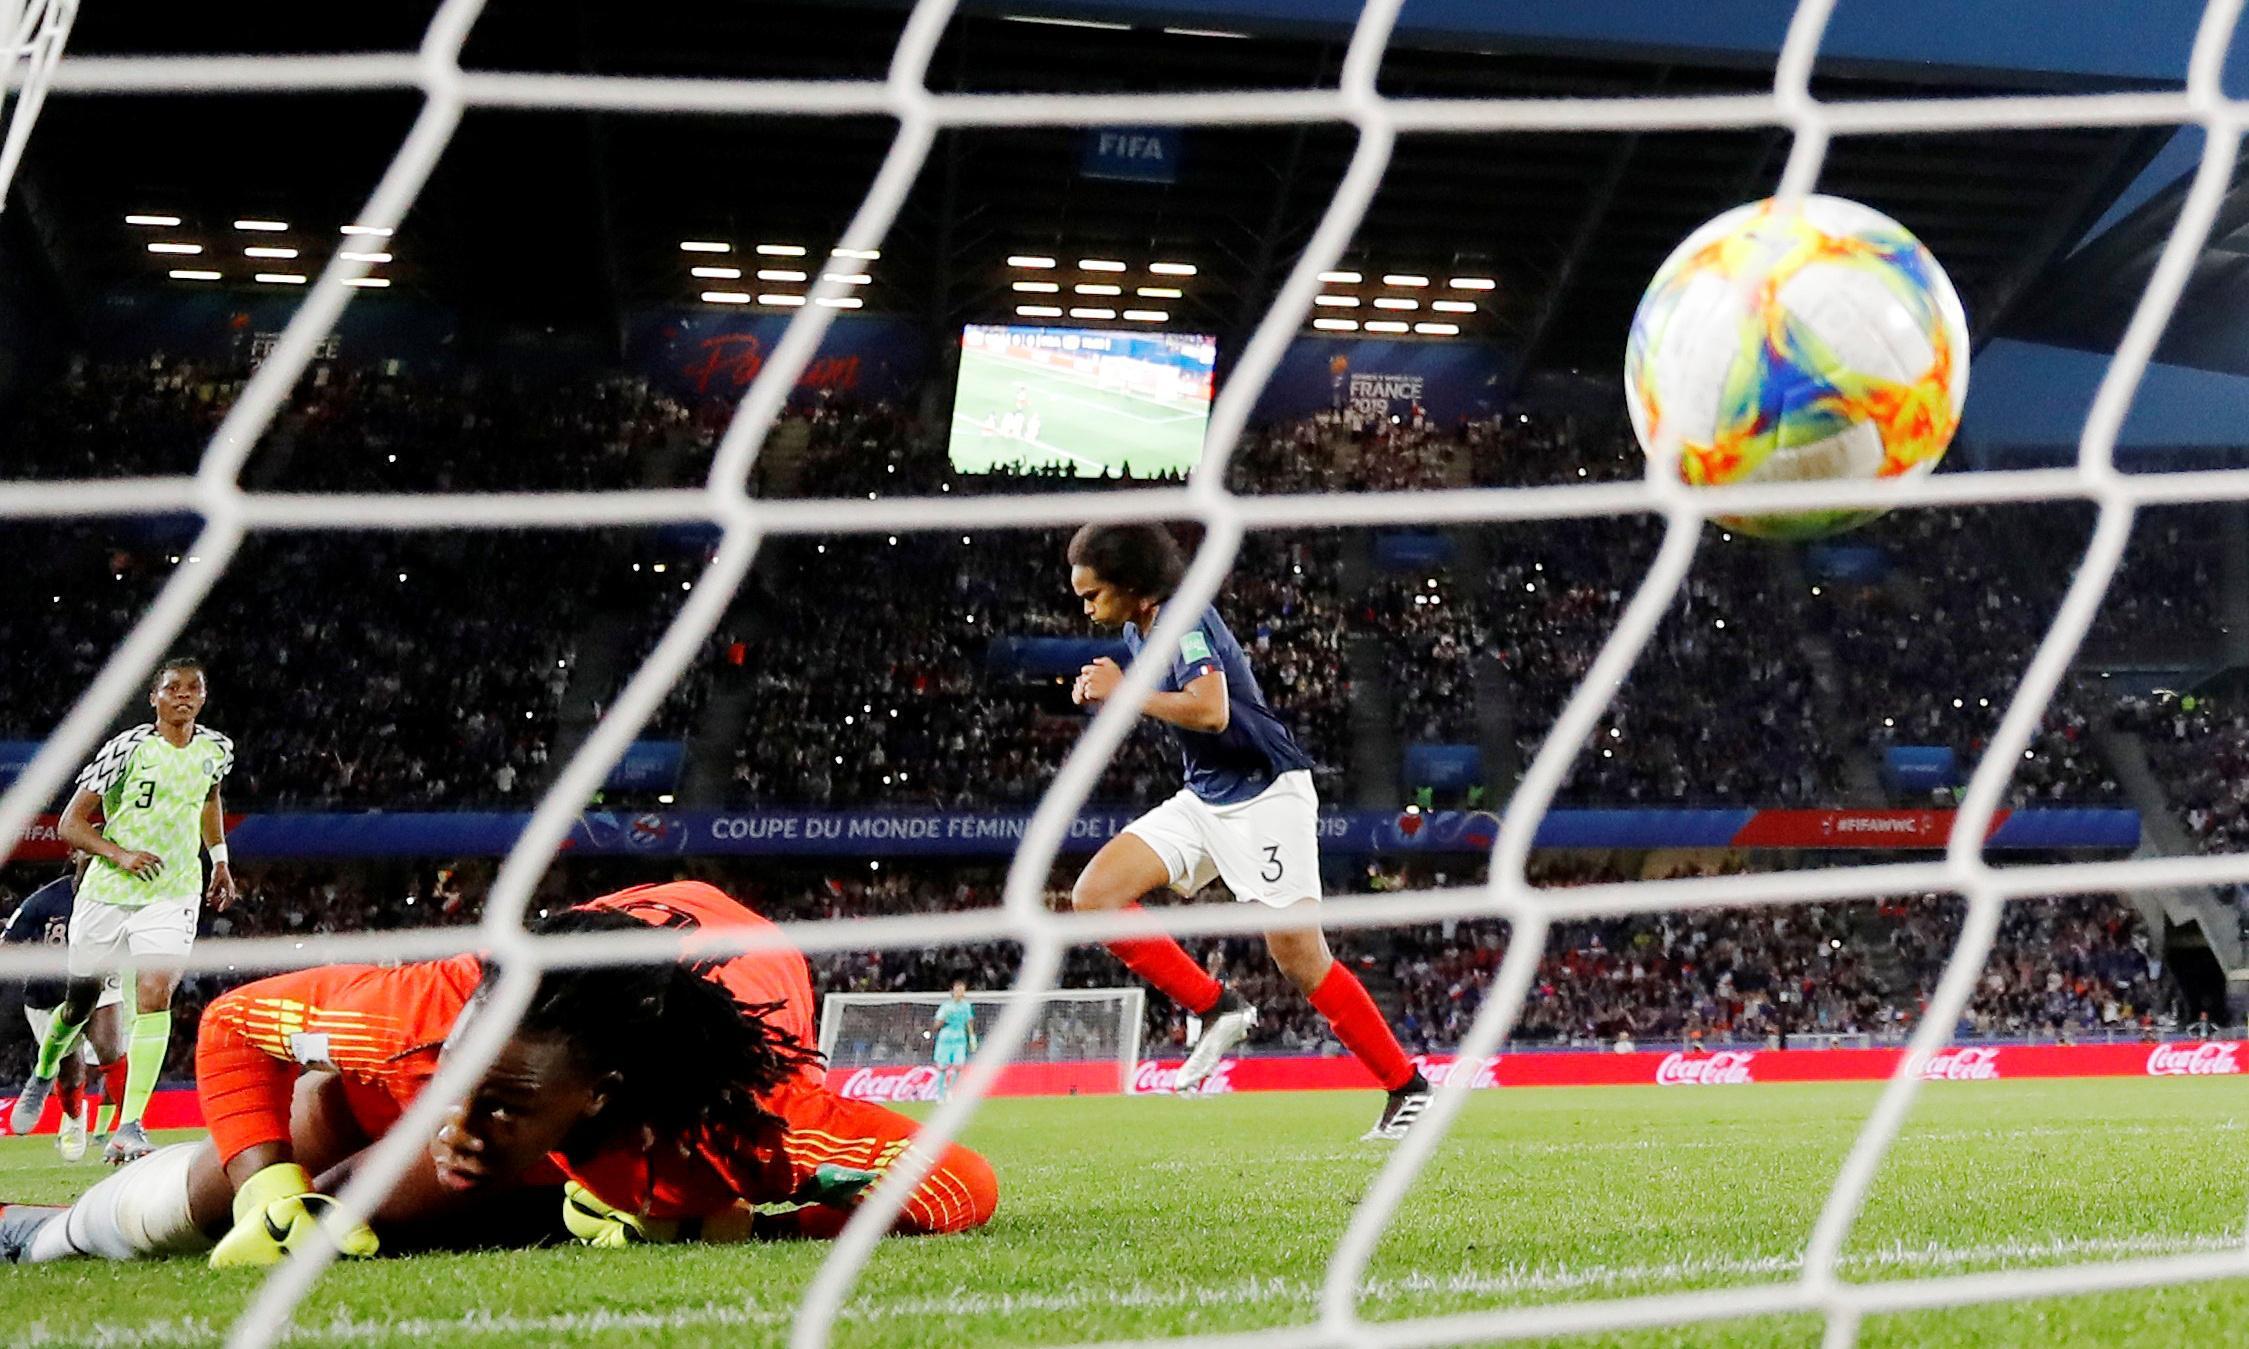 Wendie Renard's twice-taken penalty pushes France past Nigeria